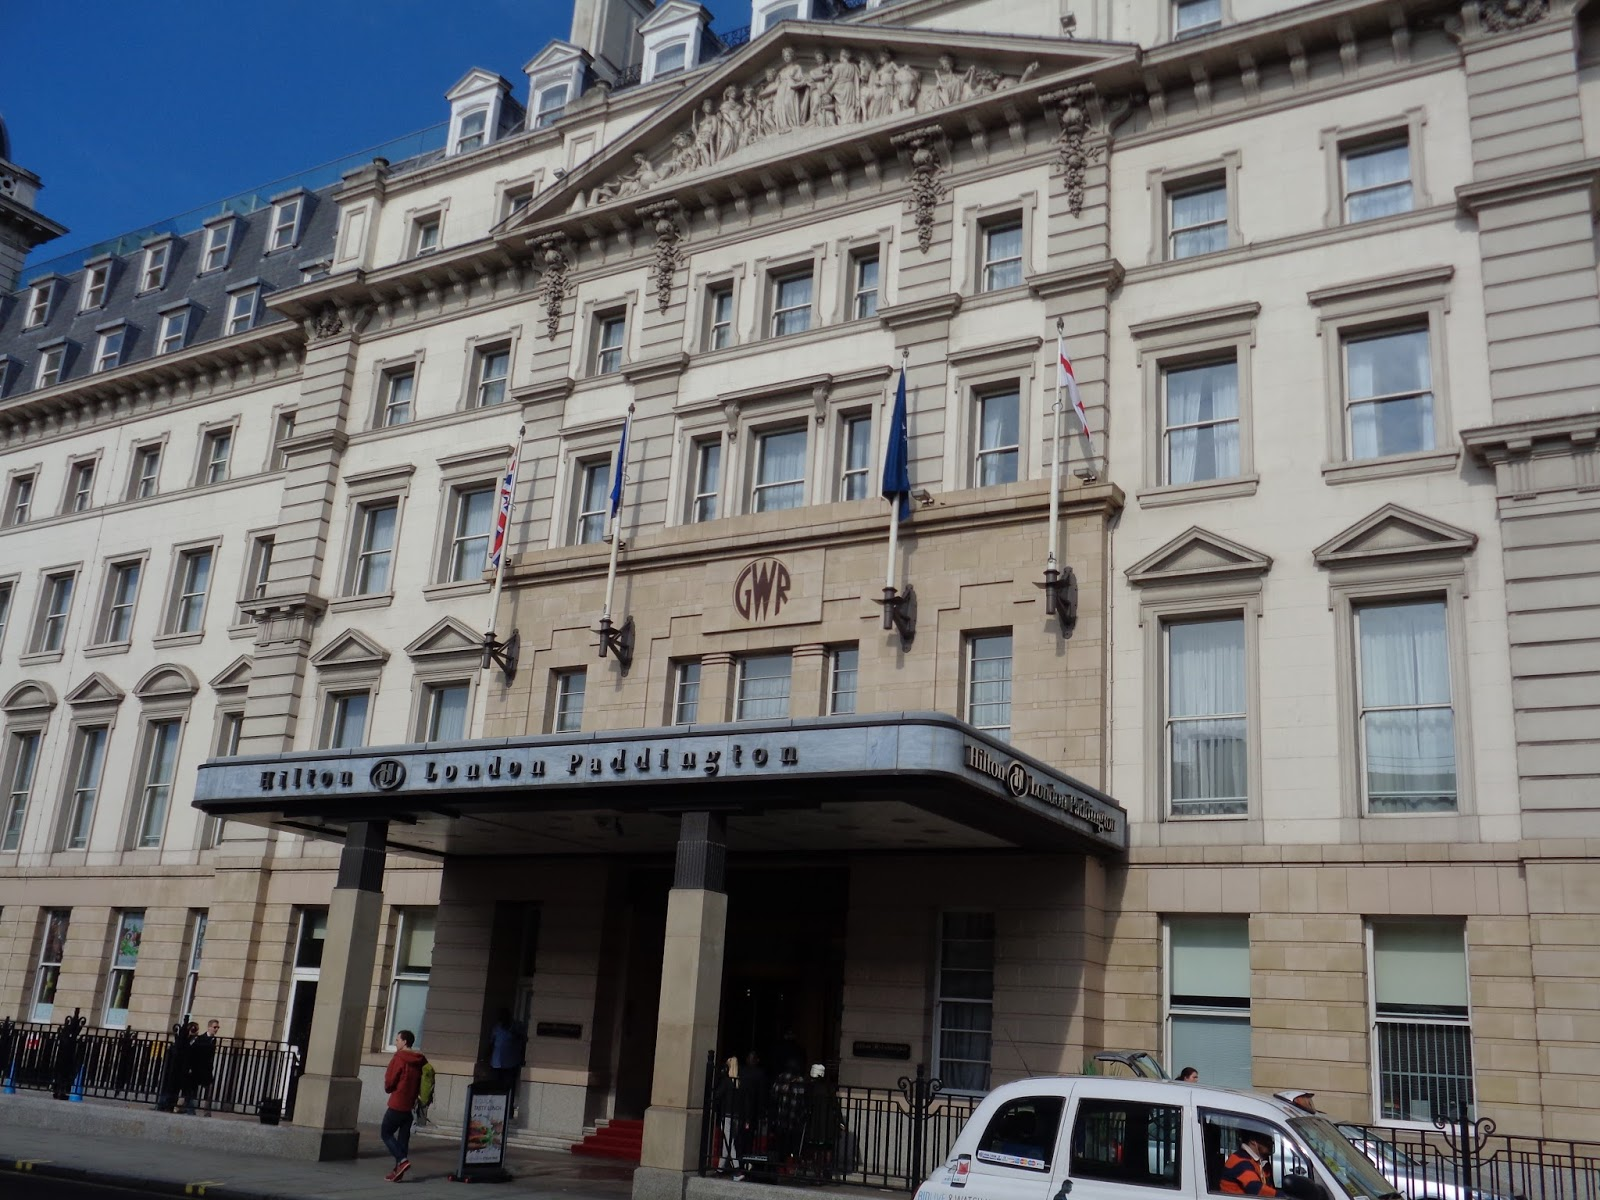 Hilton London Paddington Own Picture Taken In 2016